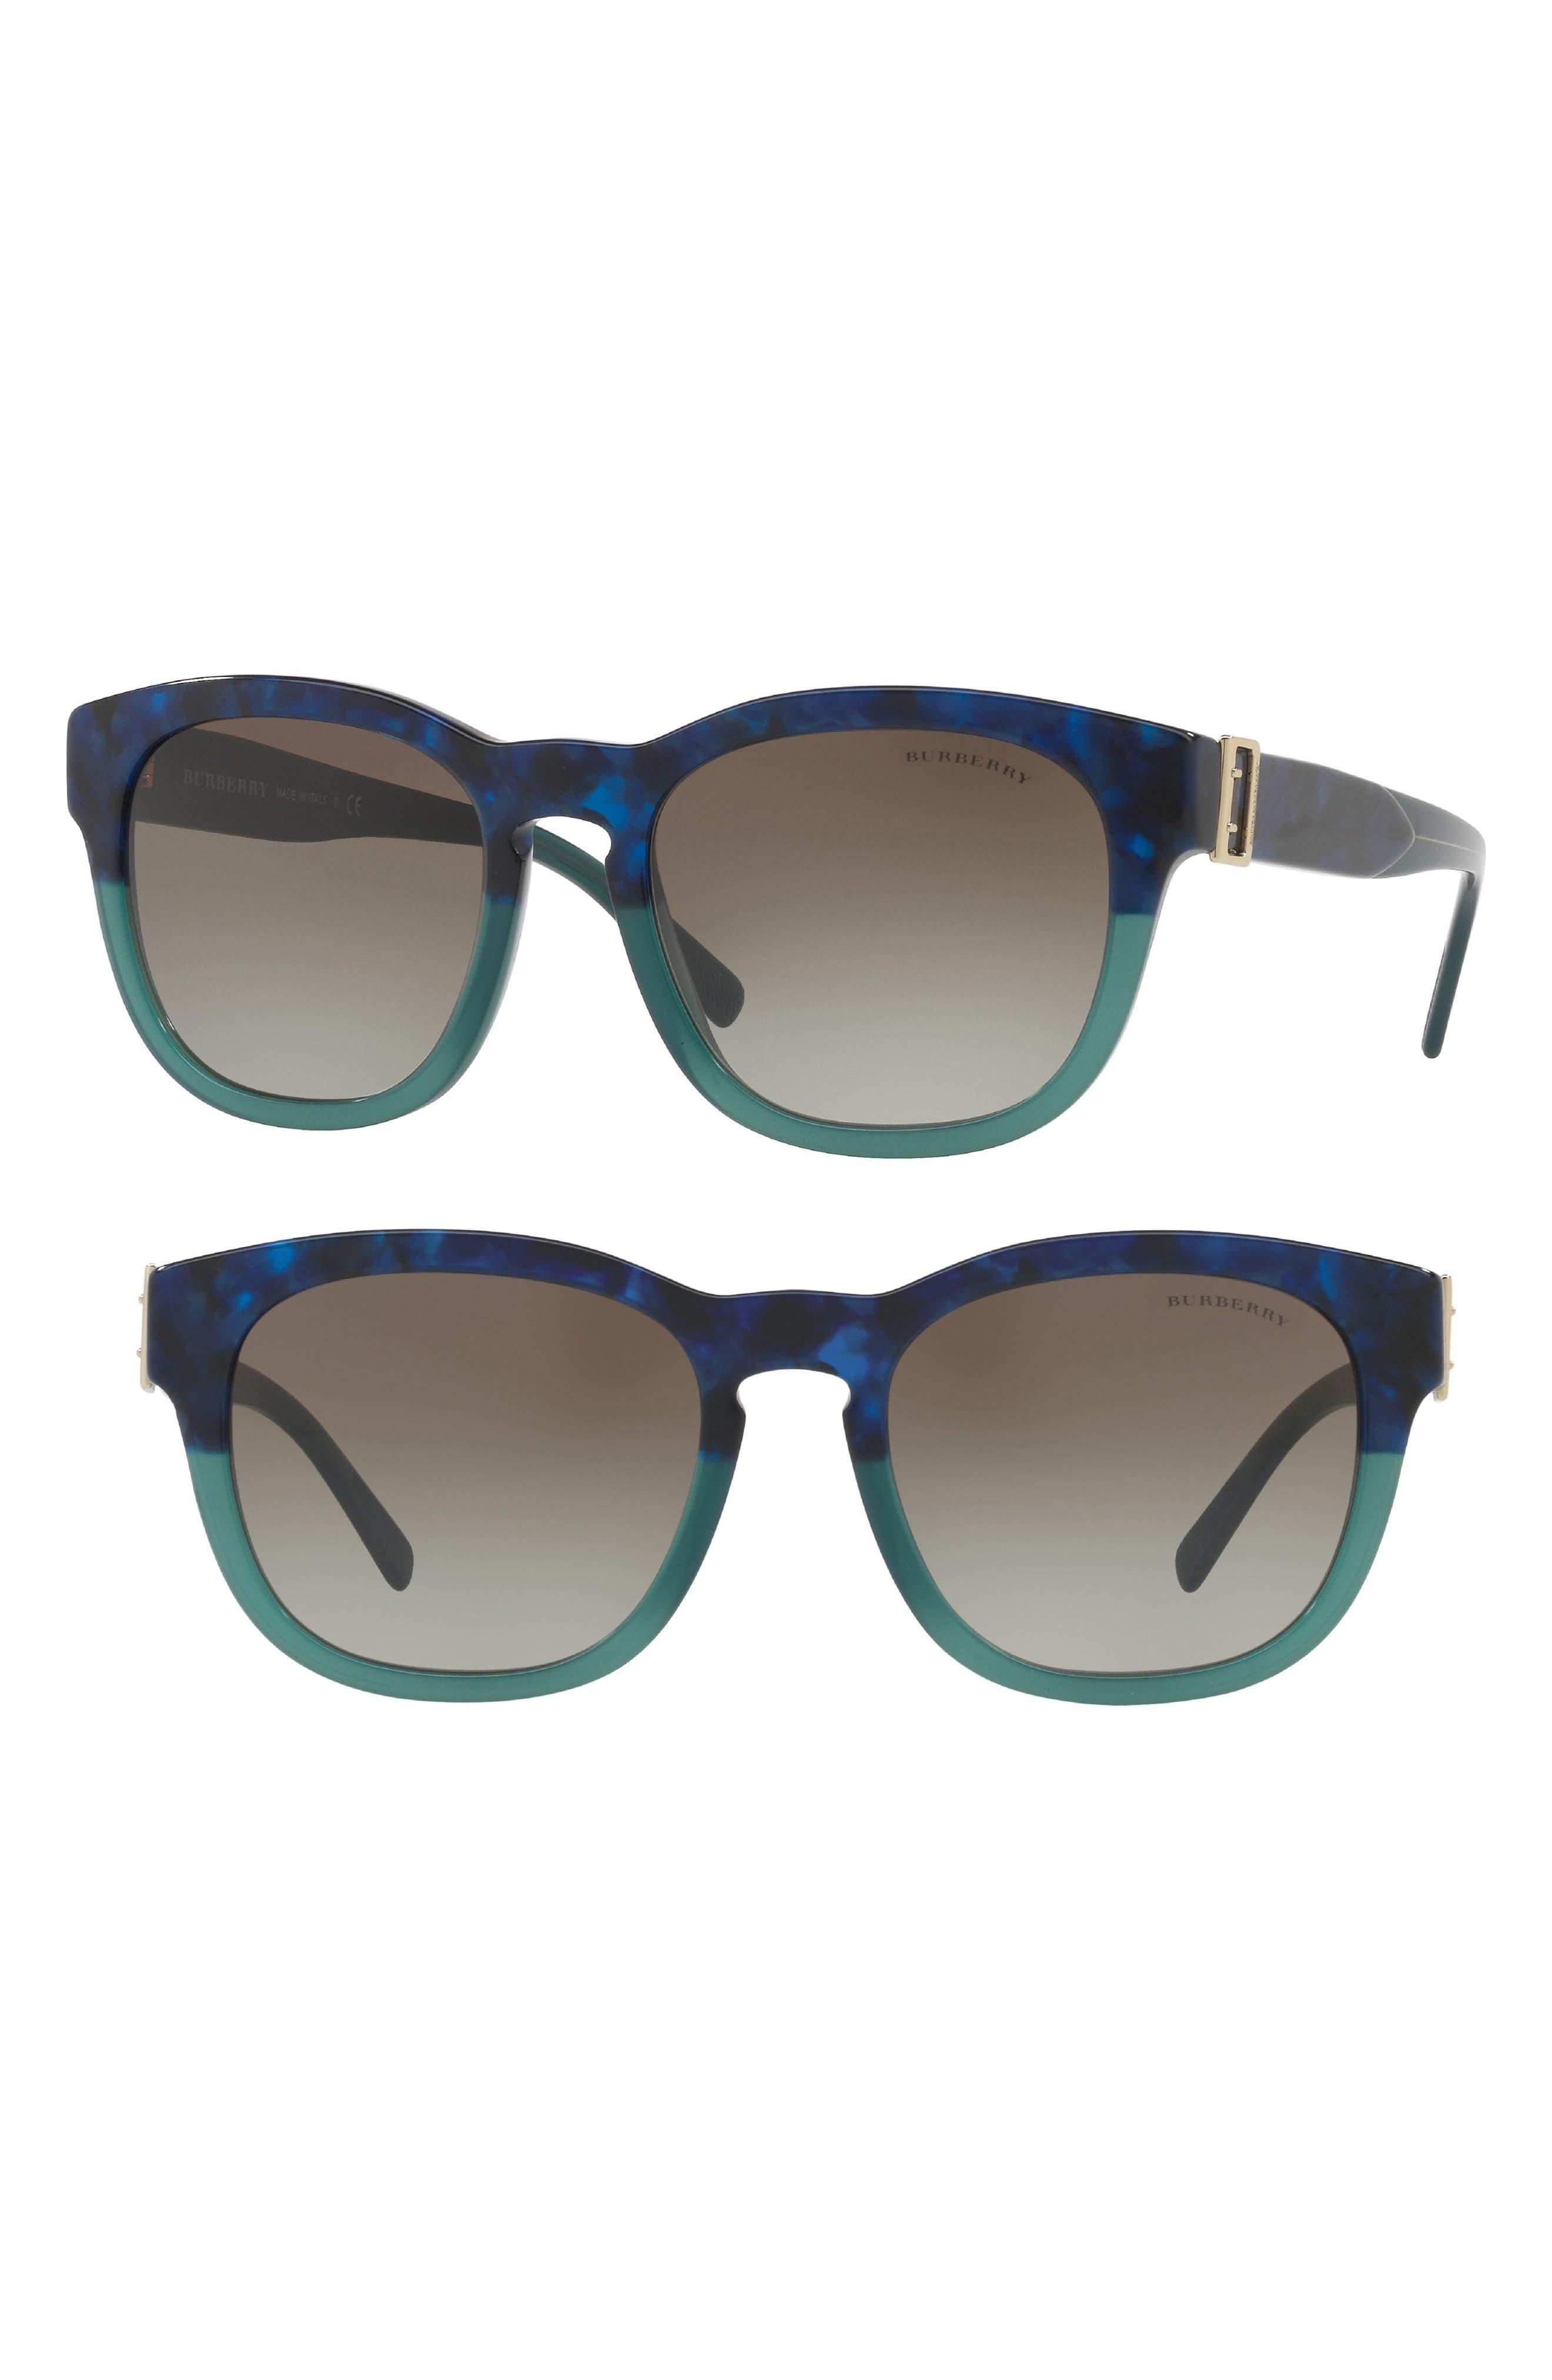 54mm Cat Eye Sunglasses,                             Main thumbnail 2, color,